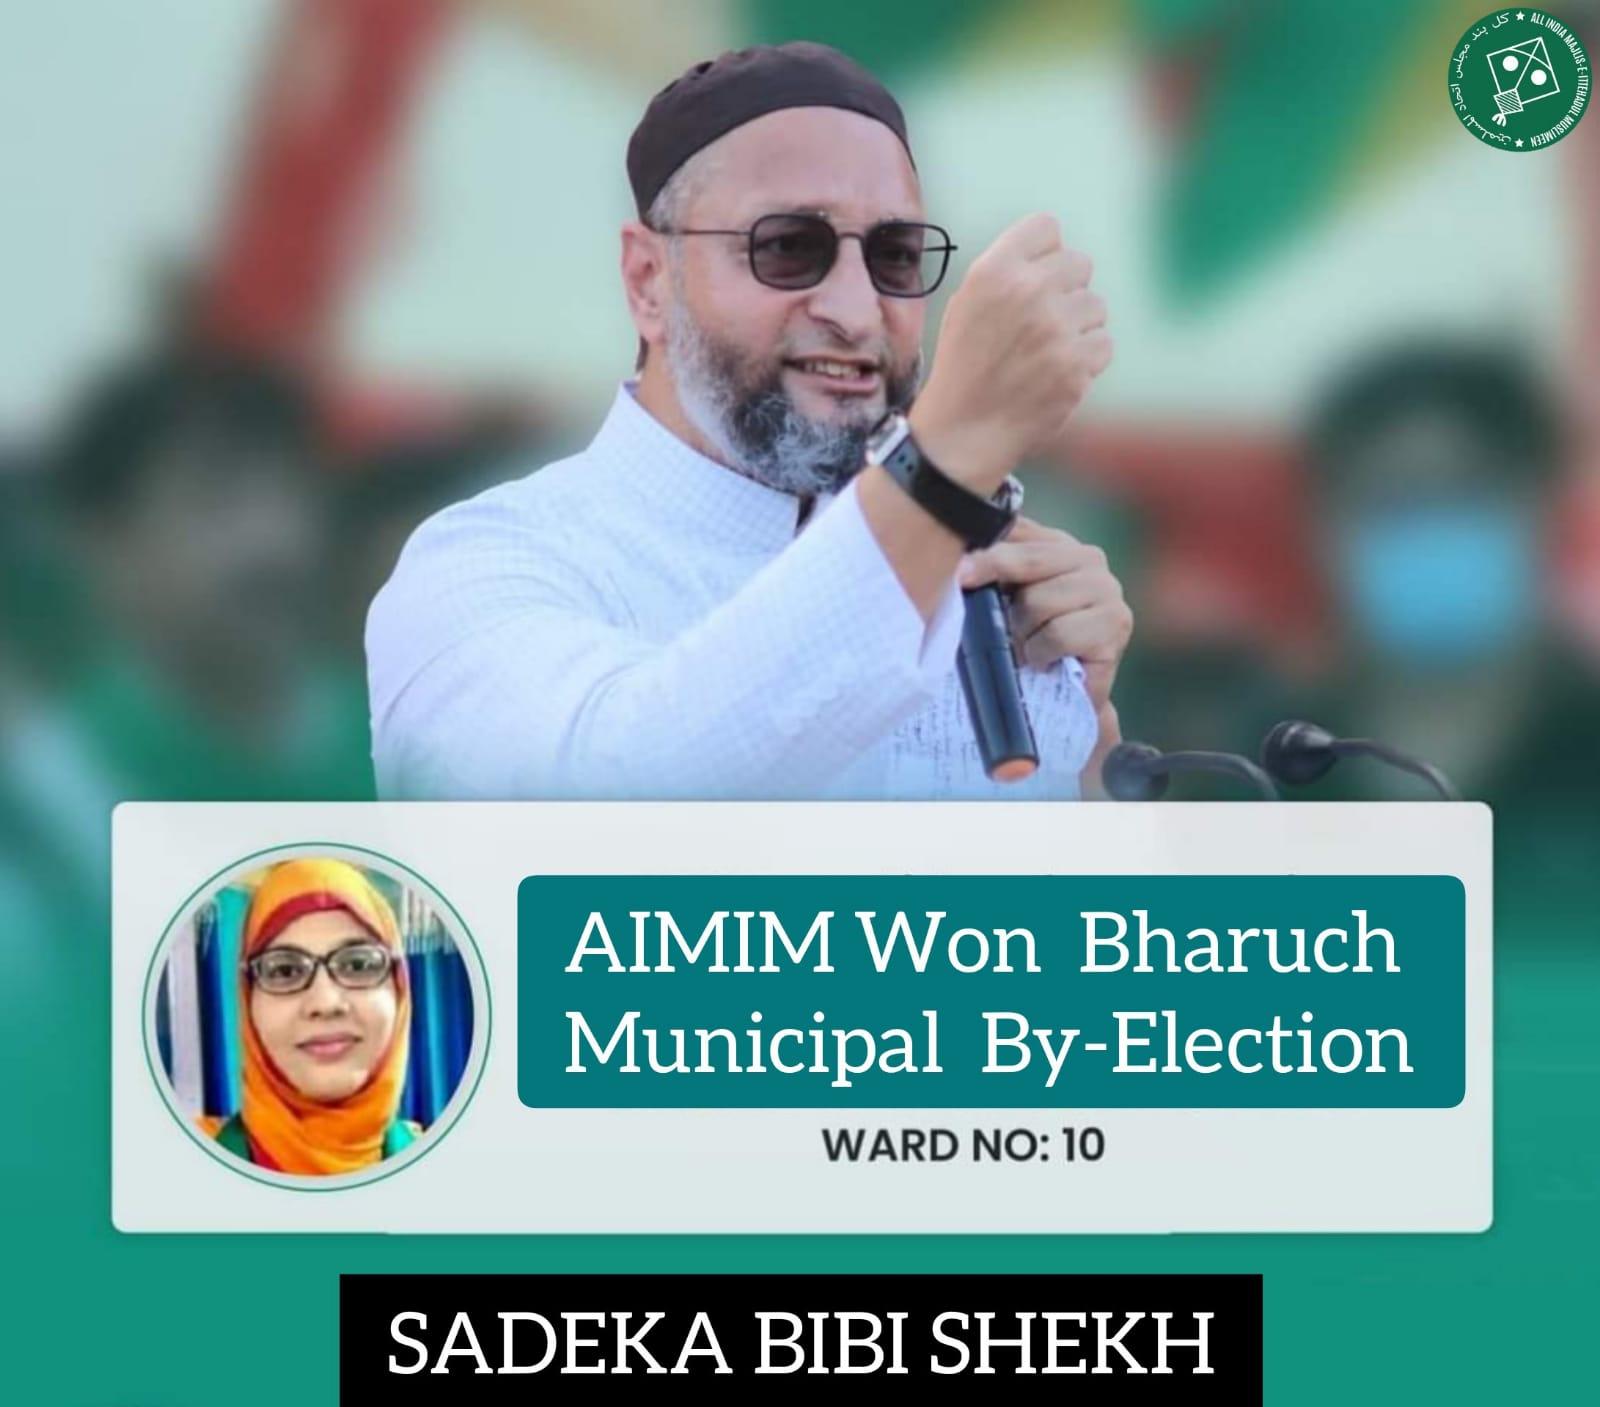 aimim-won-bharuch-municipal-by-election-from-ward-no-10-bharunch